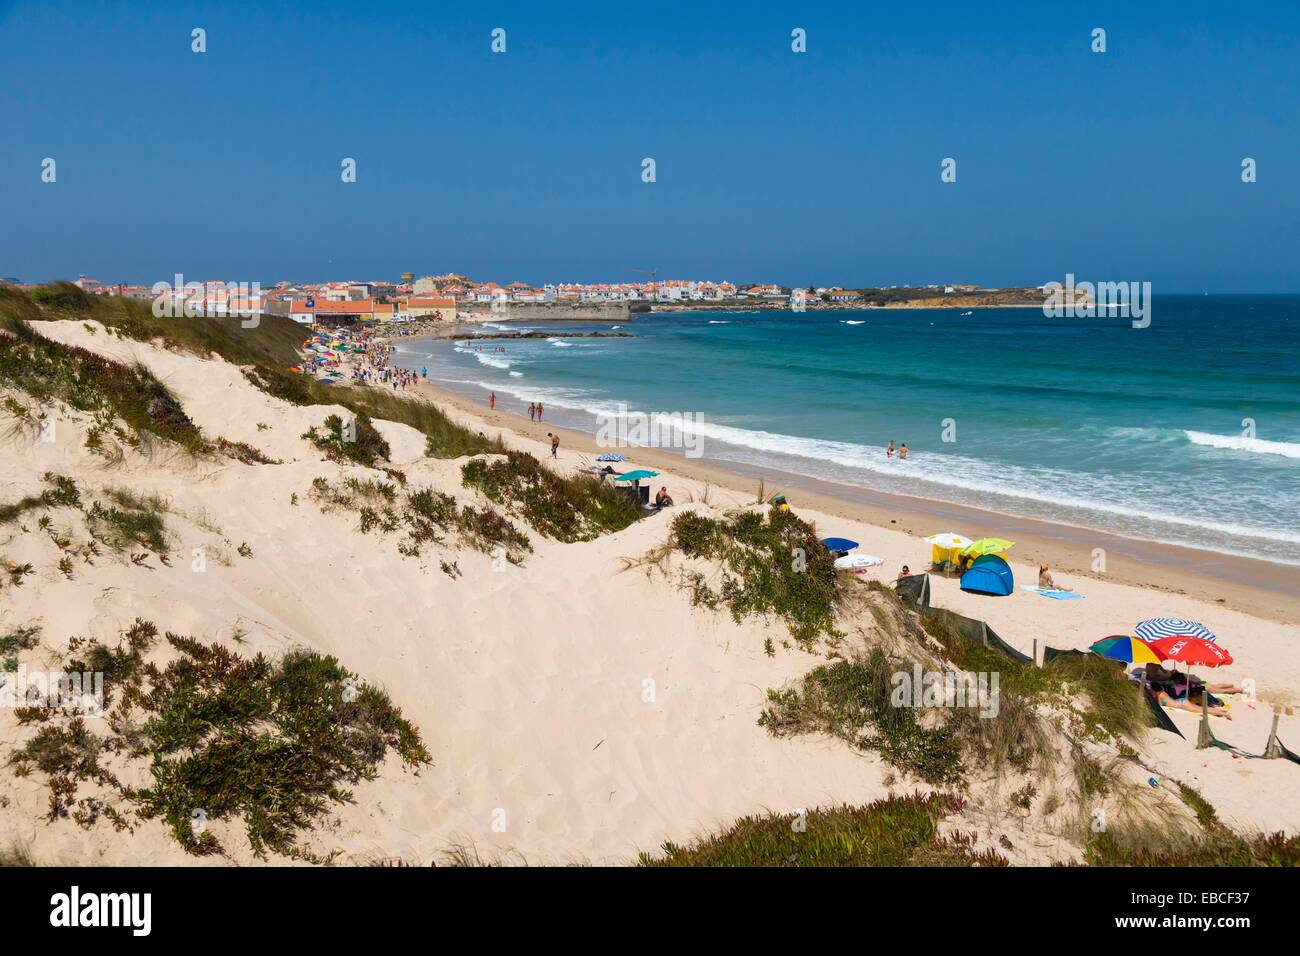 Praia da Gamboa, Peniche, Leiria District, Pinhal Litoral, Portugal. - Stock Image